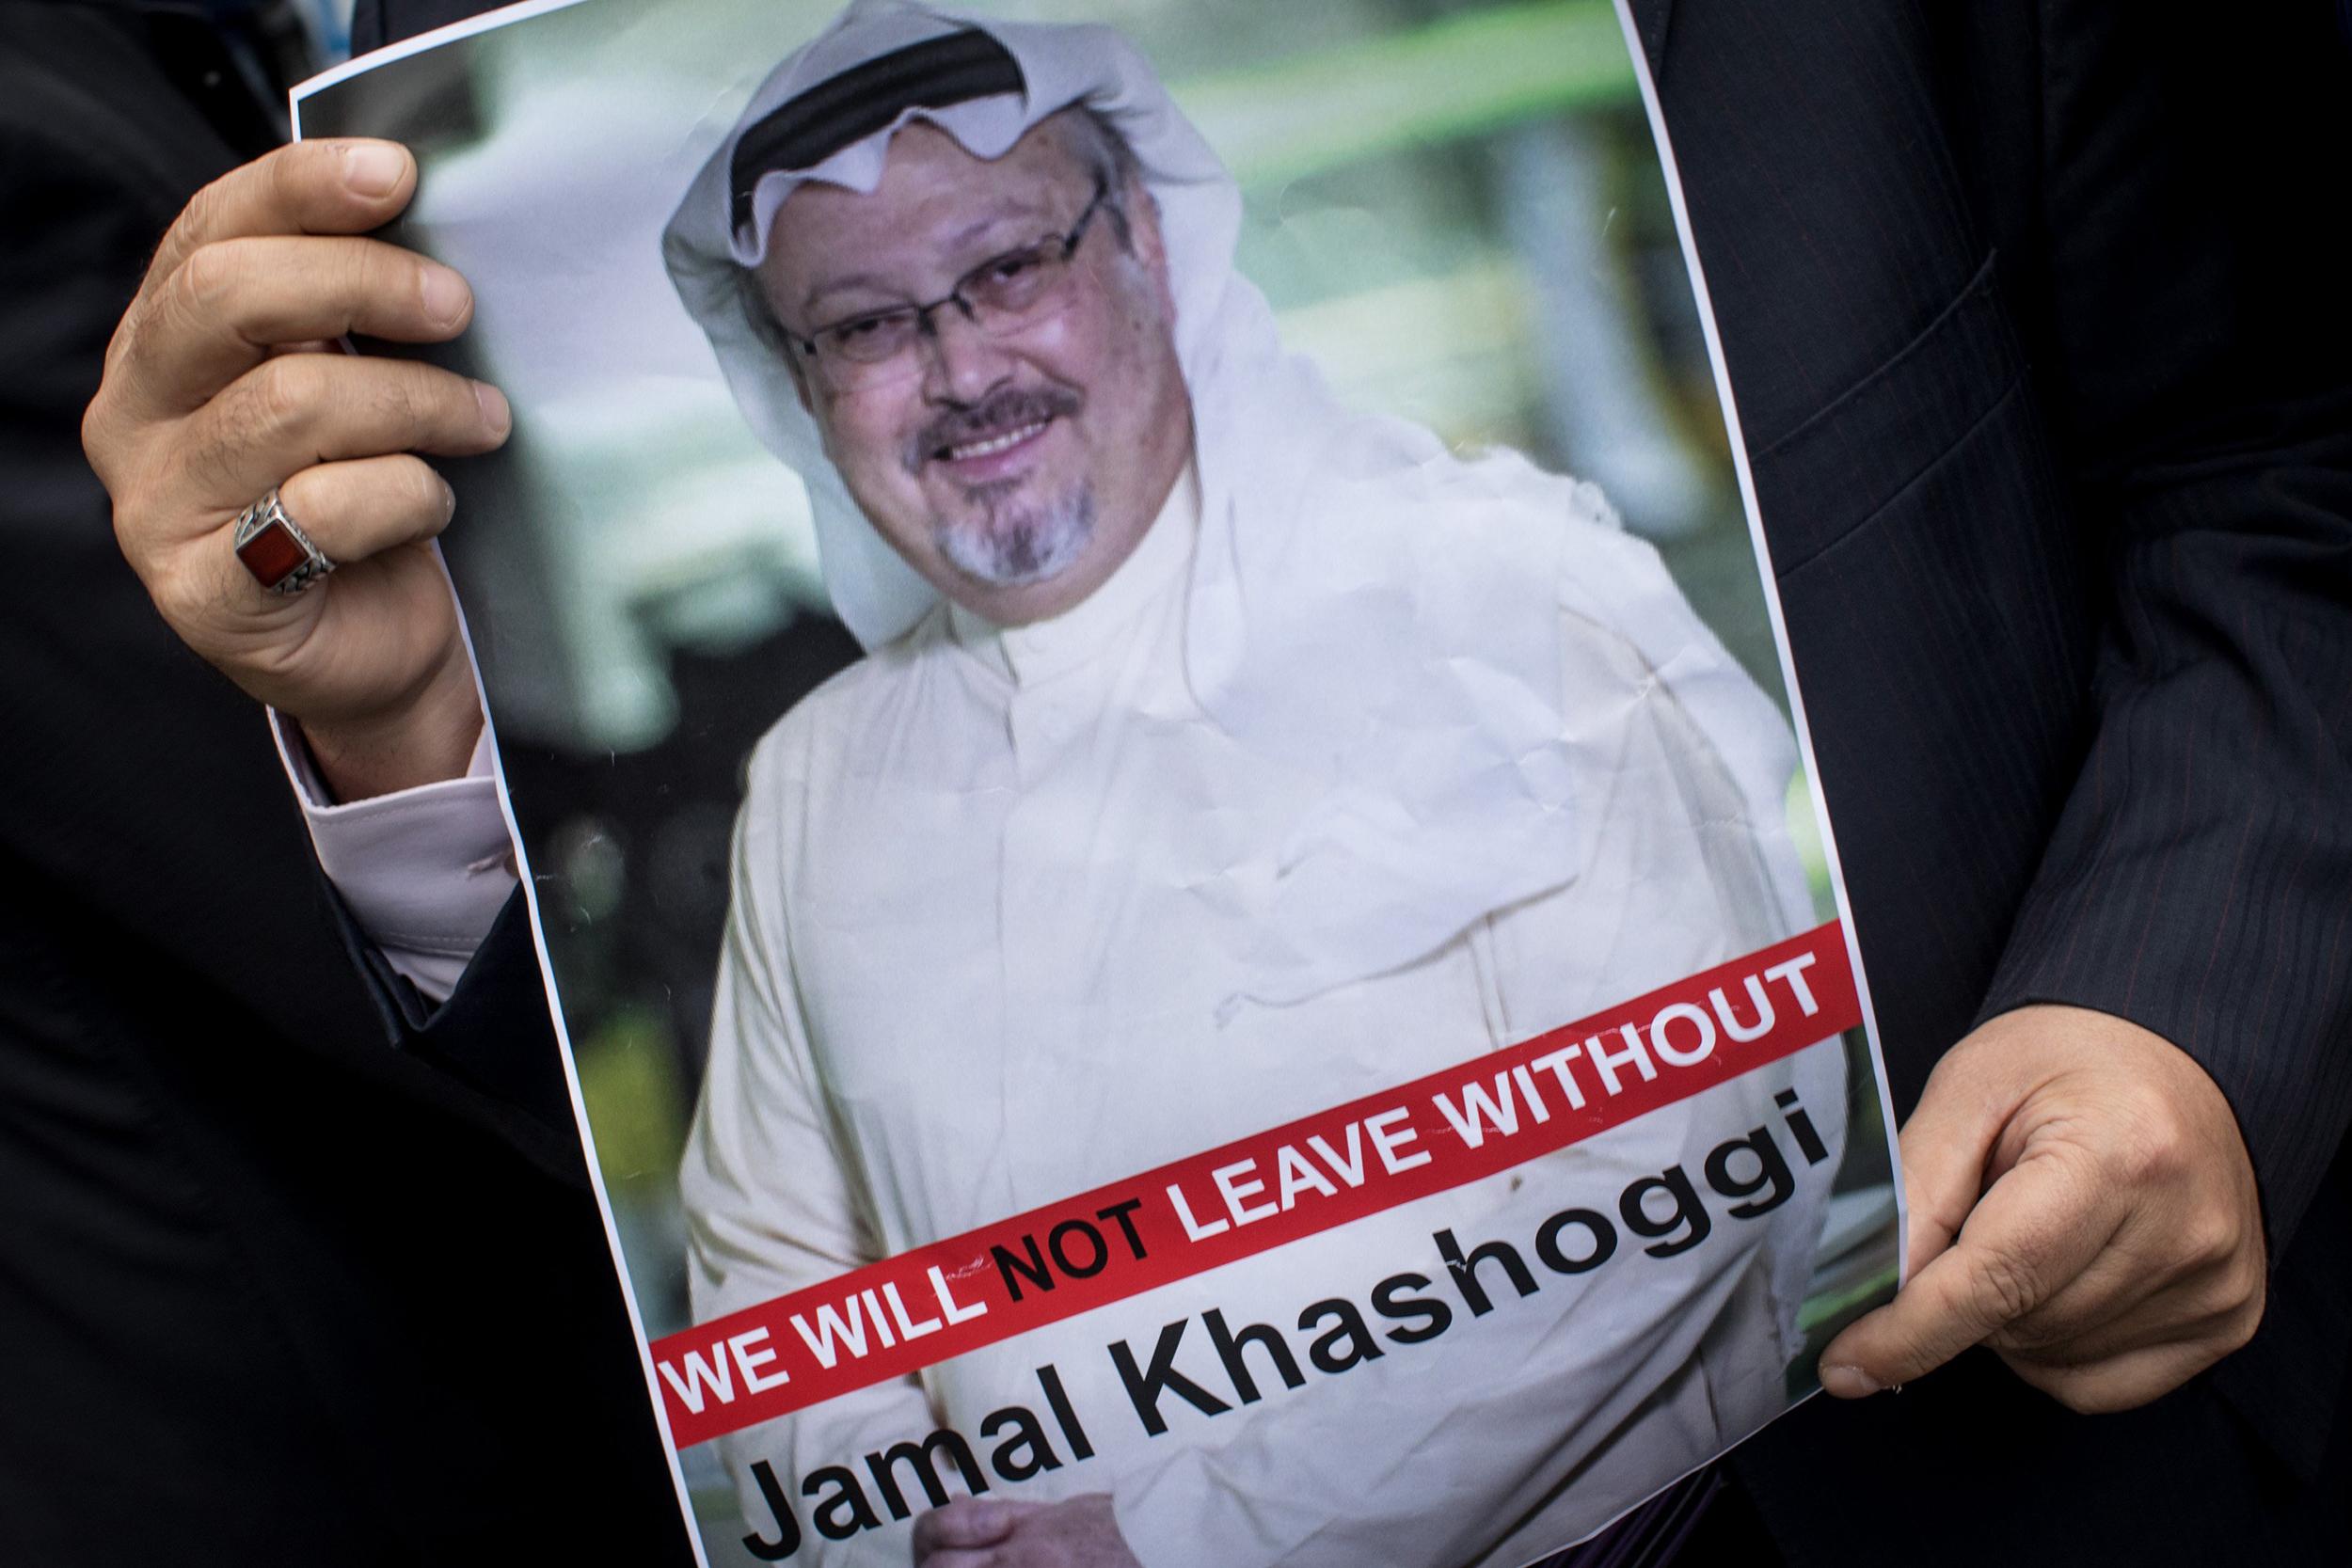 Corker-says-he-believes-Washington-Post-journalist-was-'murdered'-by-Saudi-Arabia